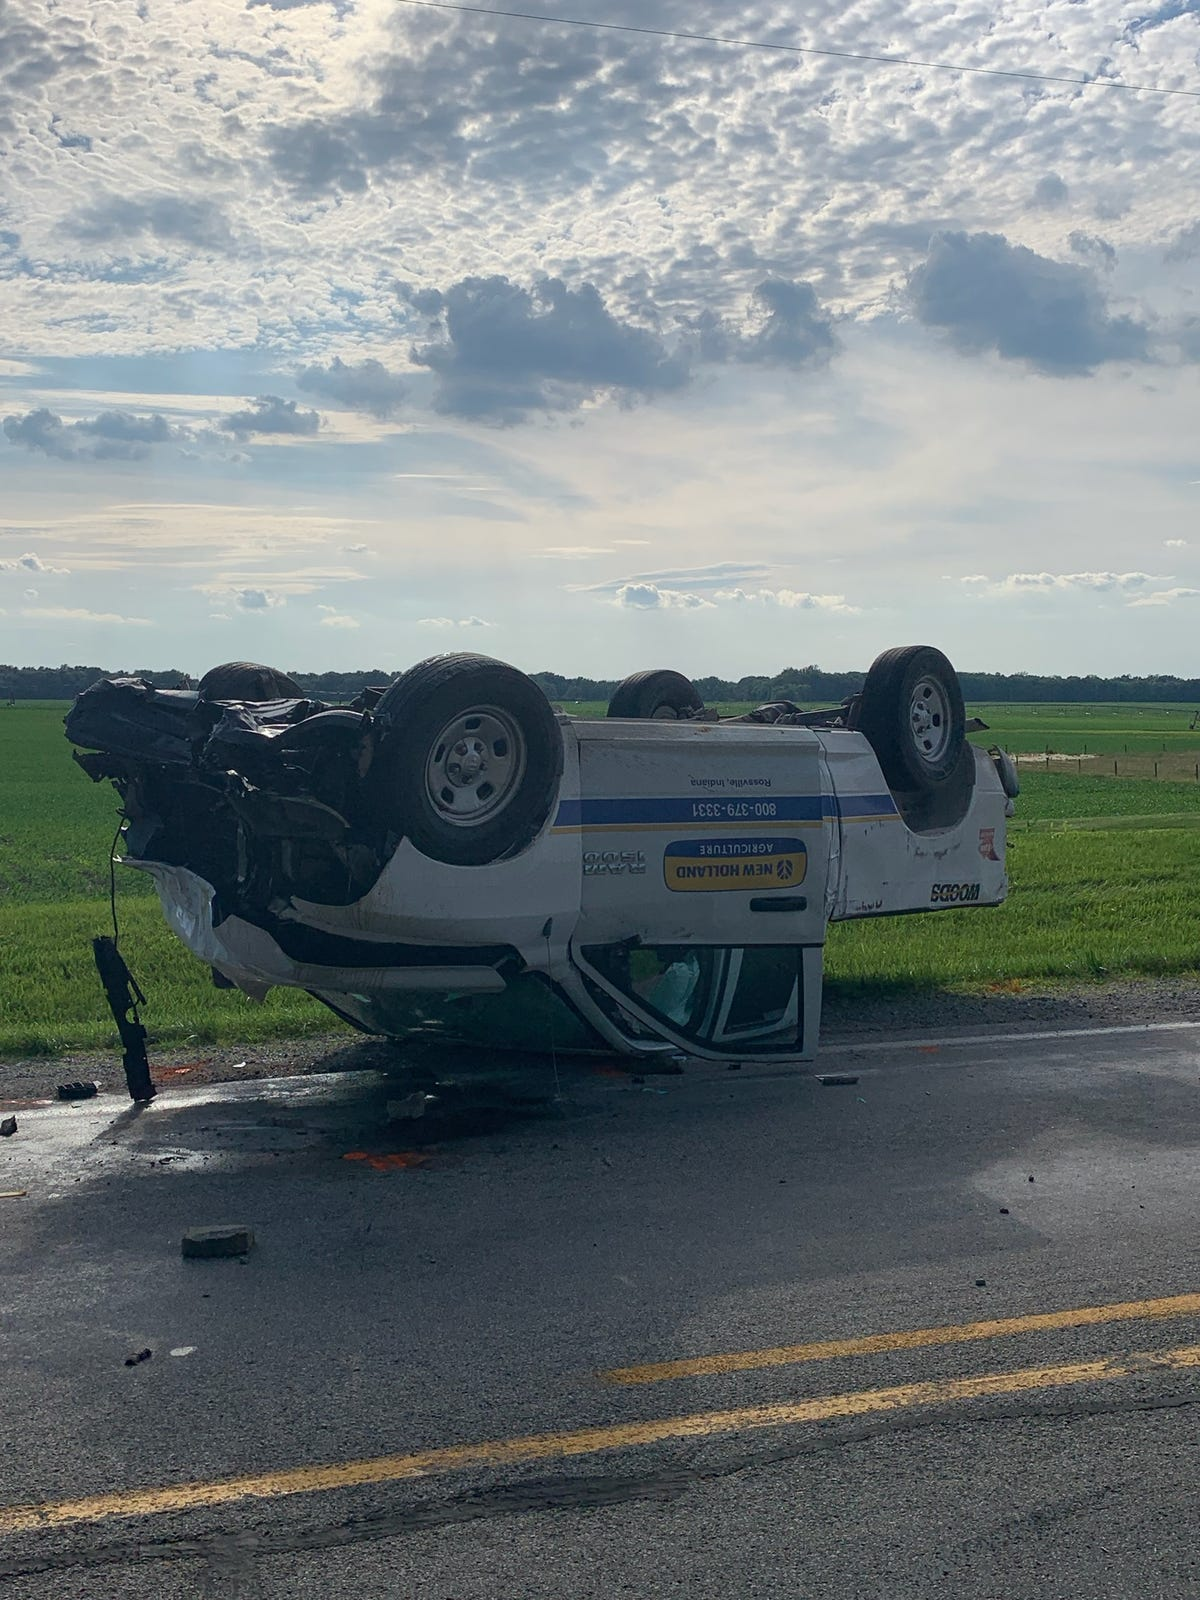 Driver of Pontiac G6 killed in car crash near Delphi